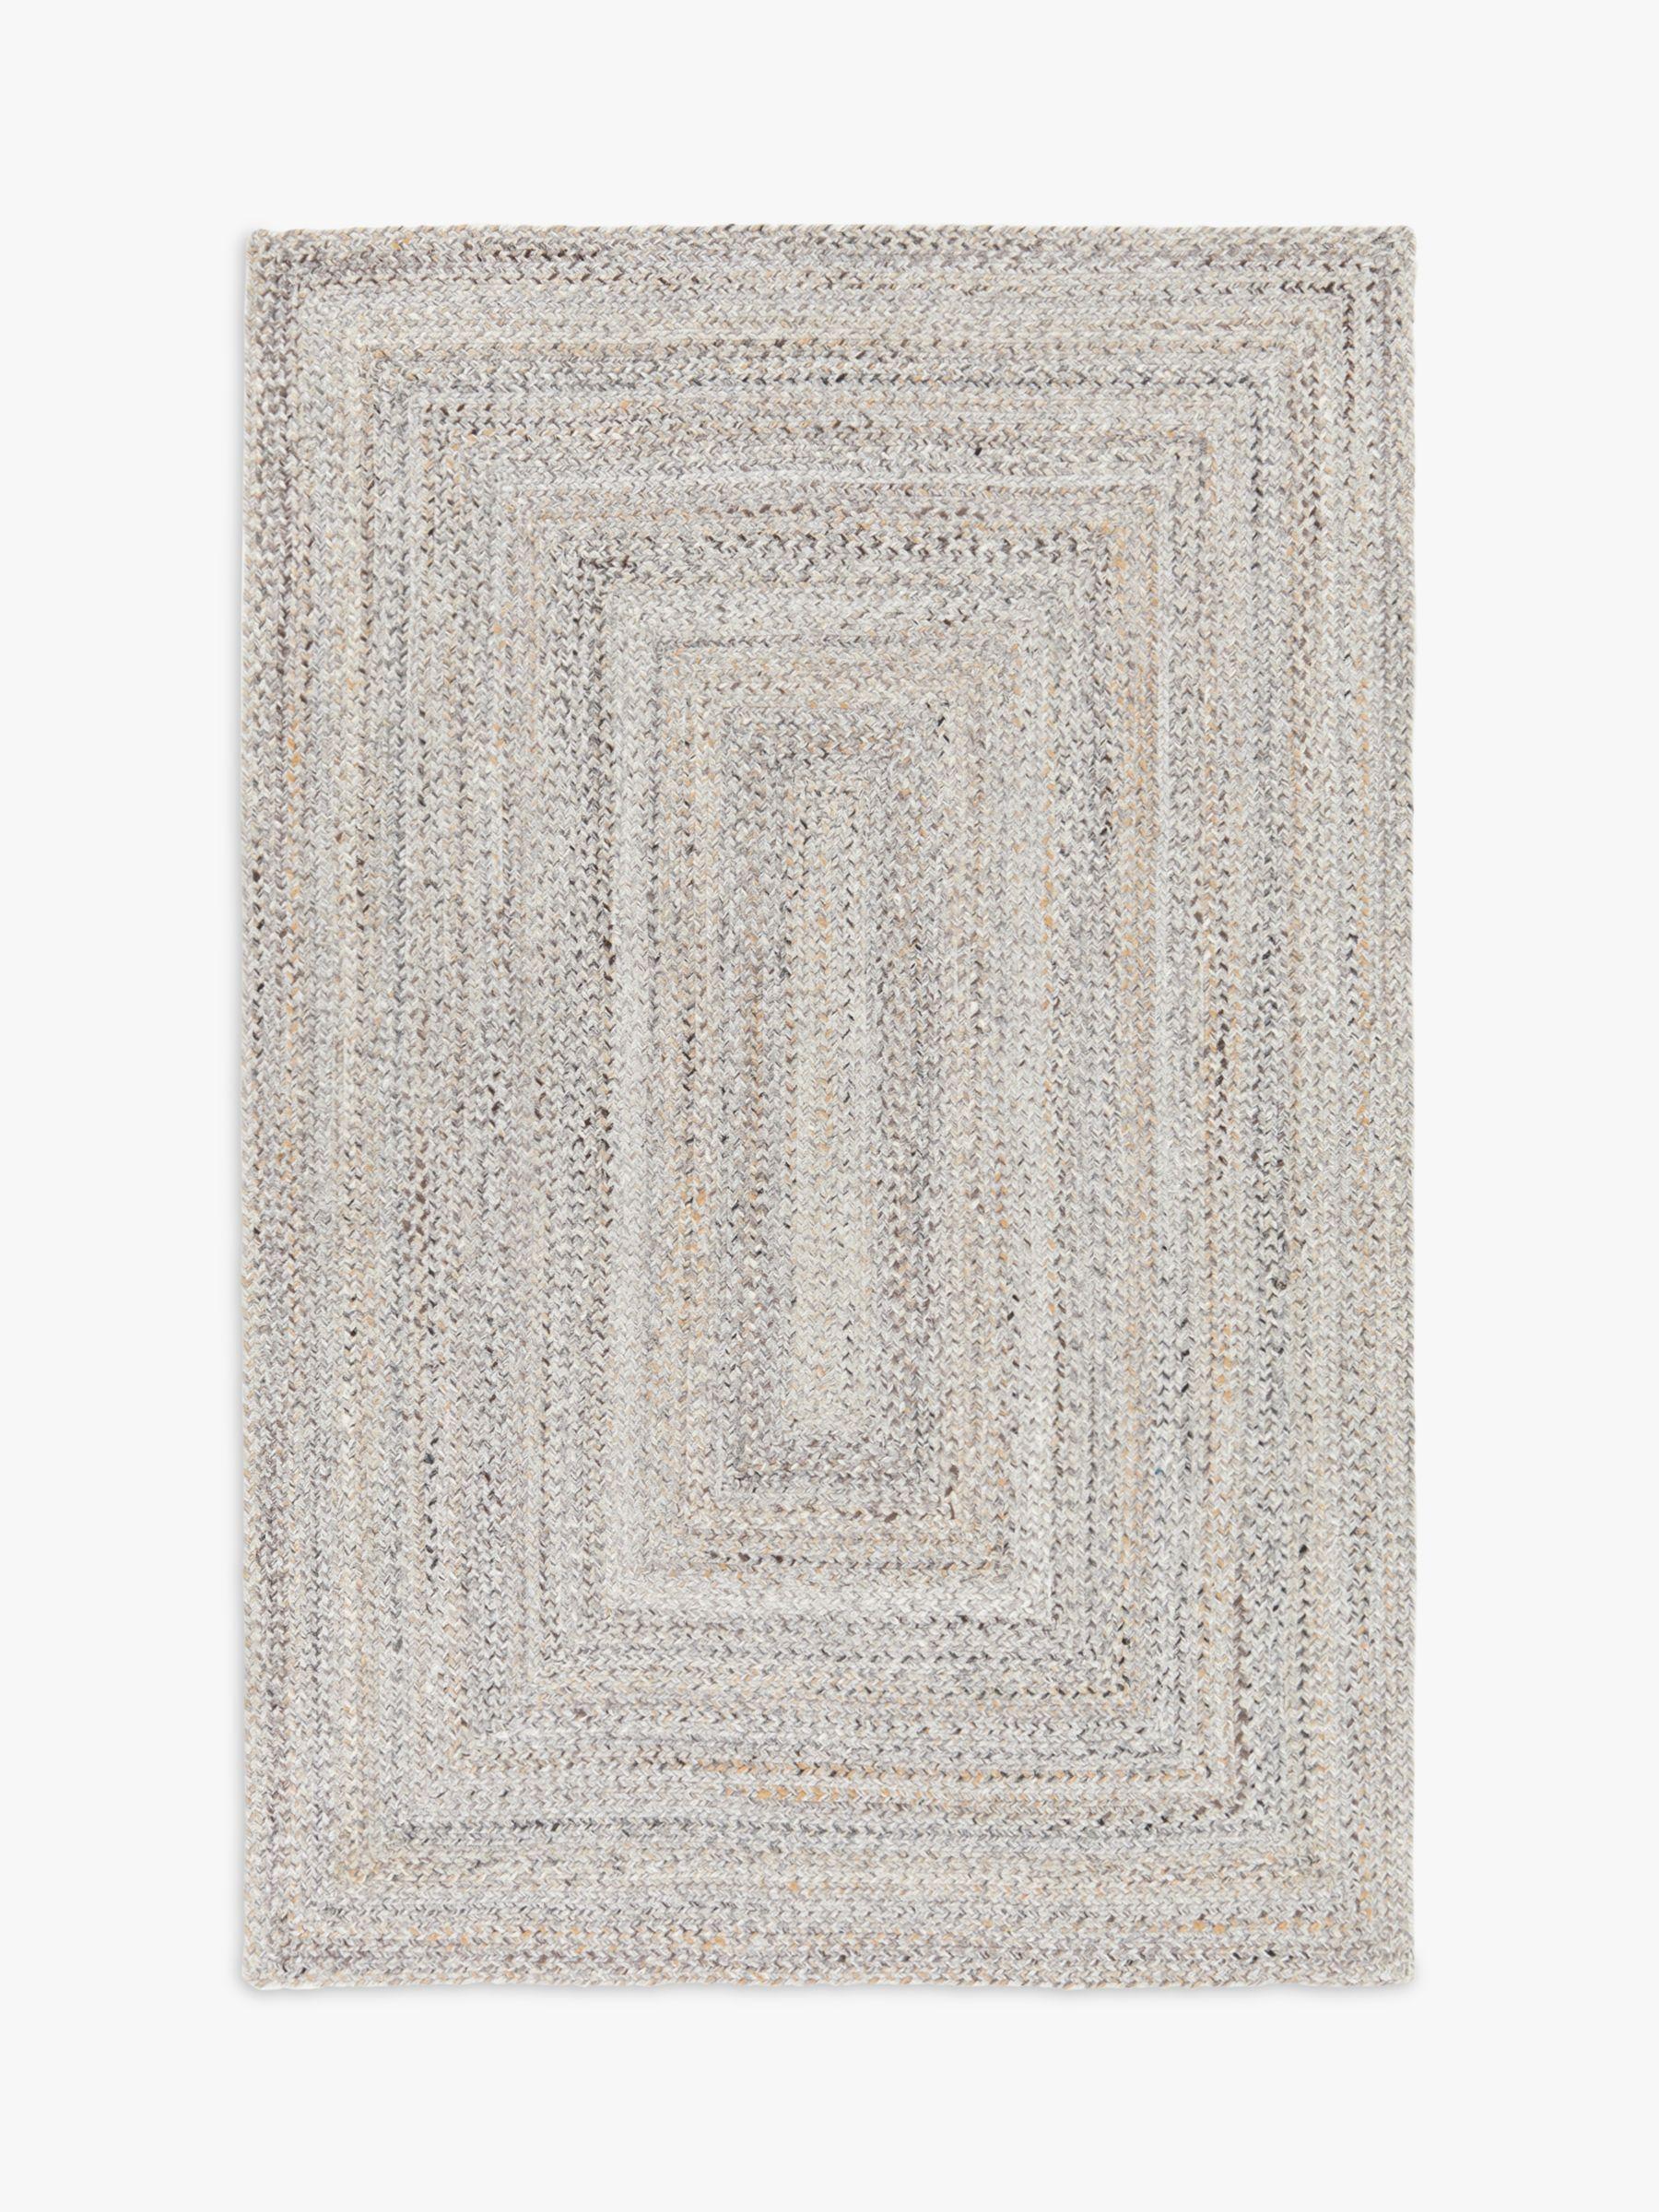 John Lewis & Partners Indoor & Outdoor Braided Rug, Marl Grey, L180 x W120 cm